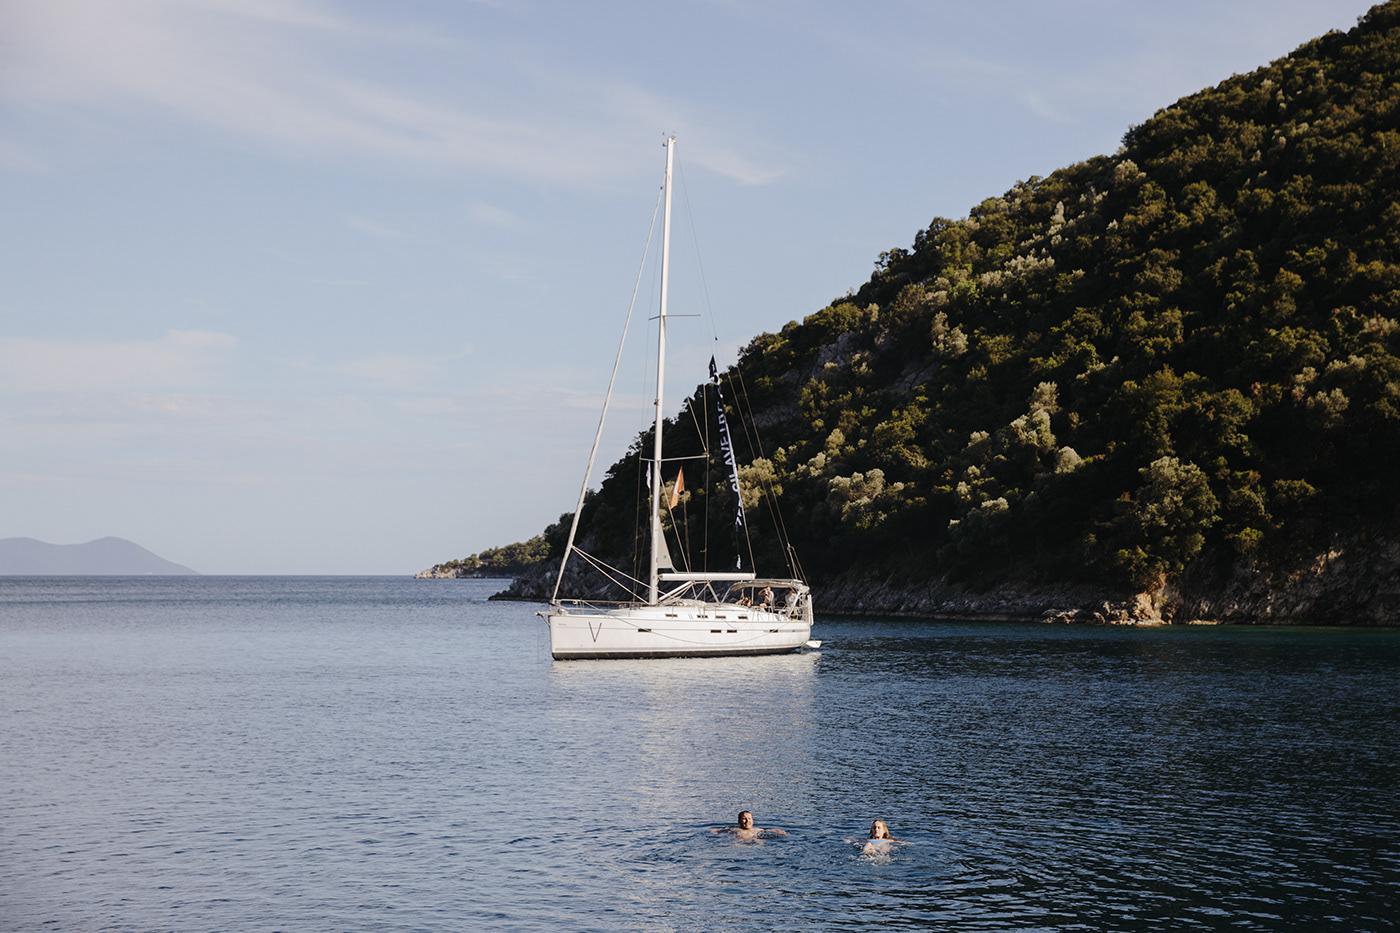 Greece Ocean reportage Sail sailboat sailing sailinglife Sailor sea Yachting